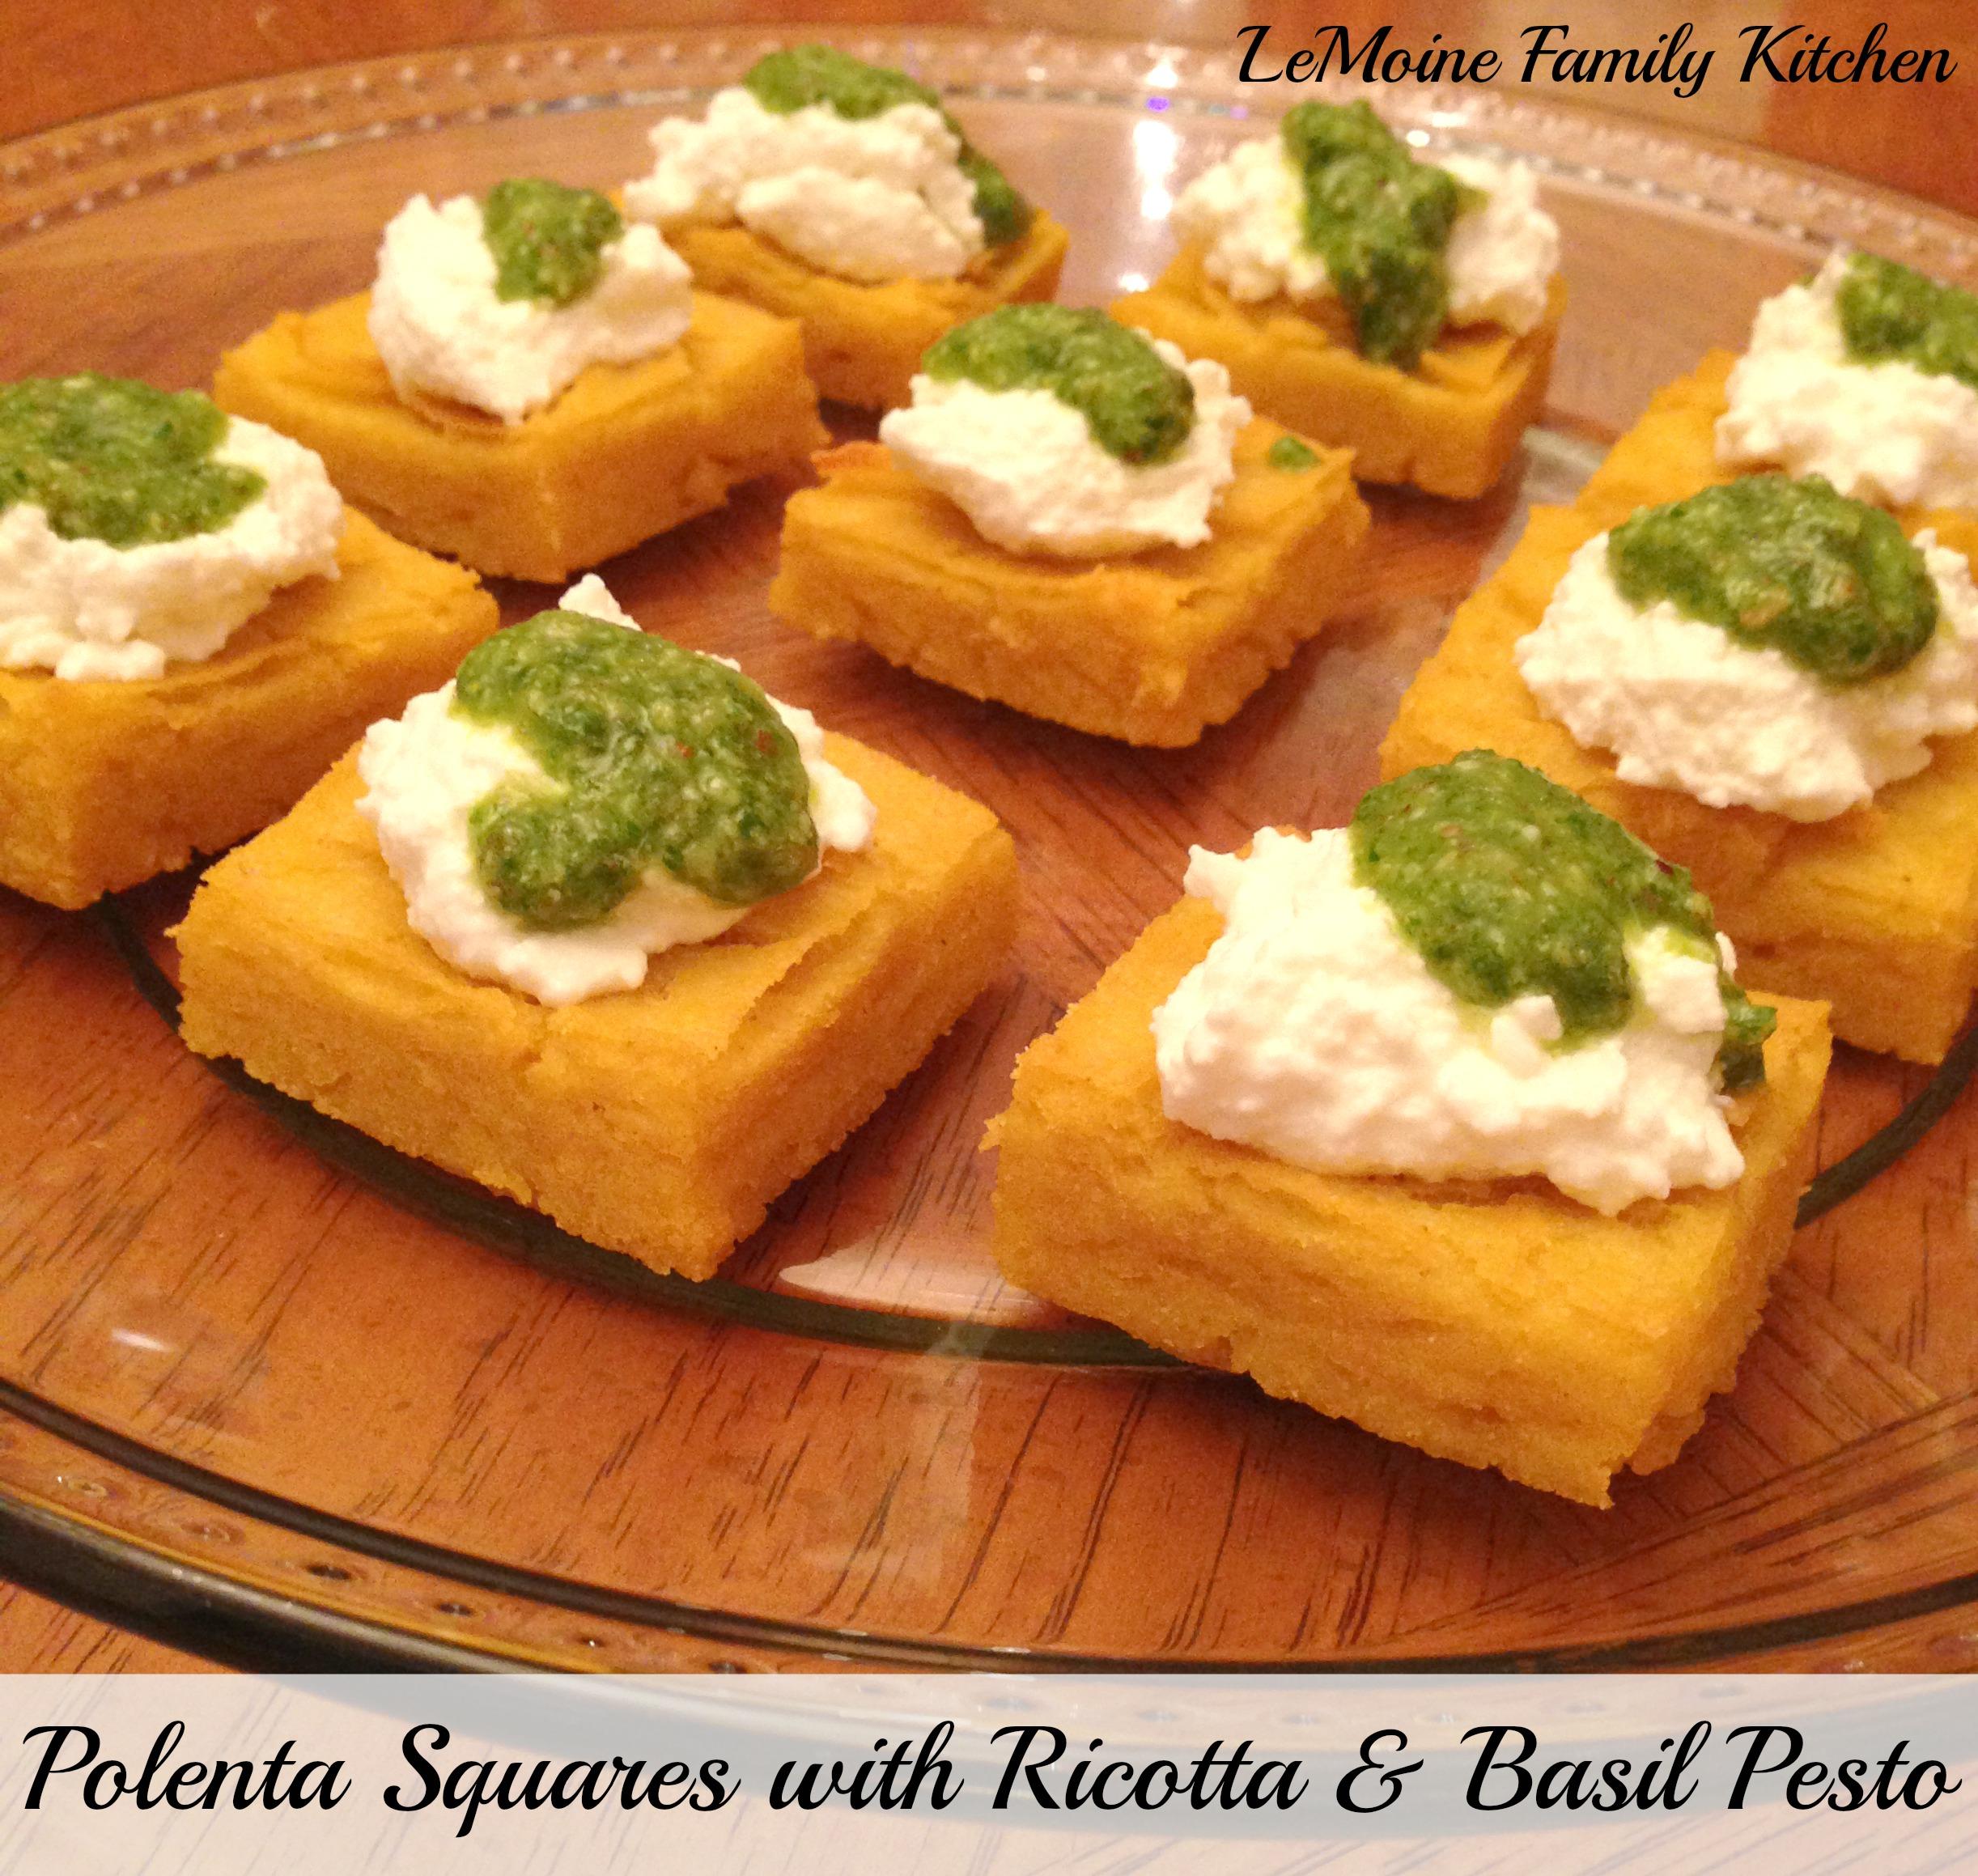 Polenta Squares with Ricotta & Basil Pesto